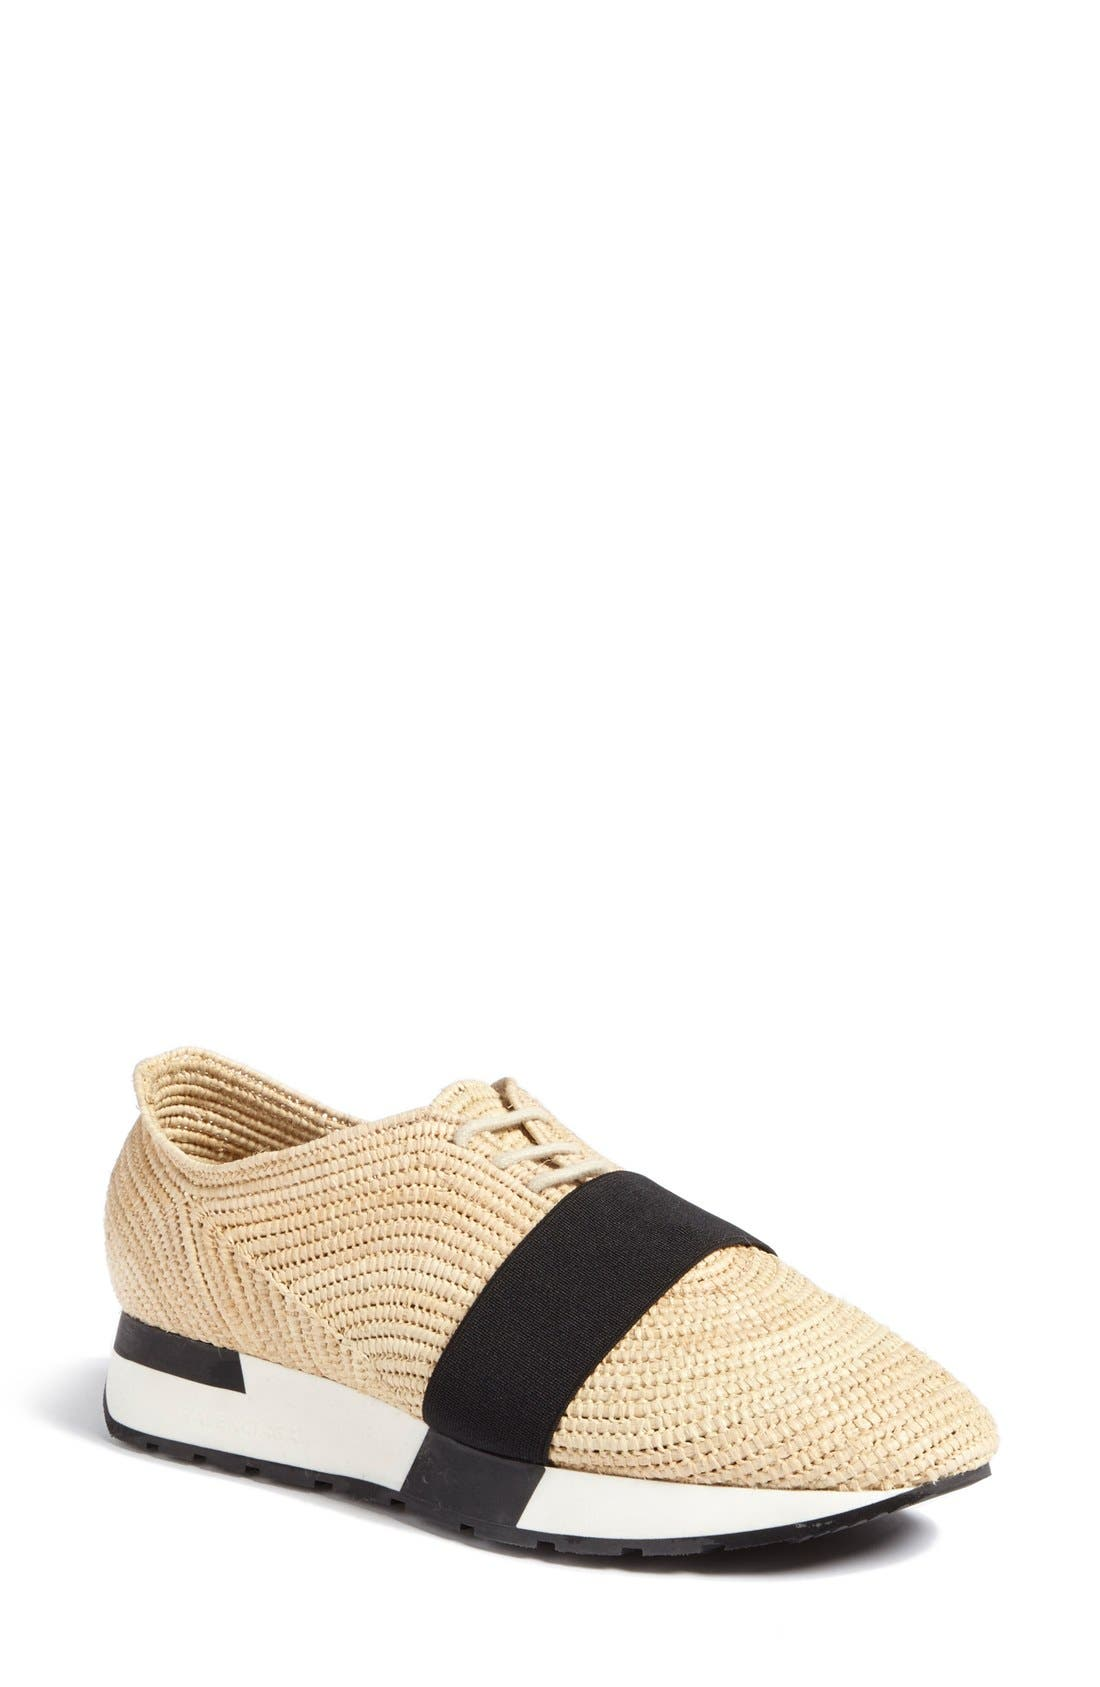 Main Image - Balenciaga 'Runner' Raffia Sneaker (Women)